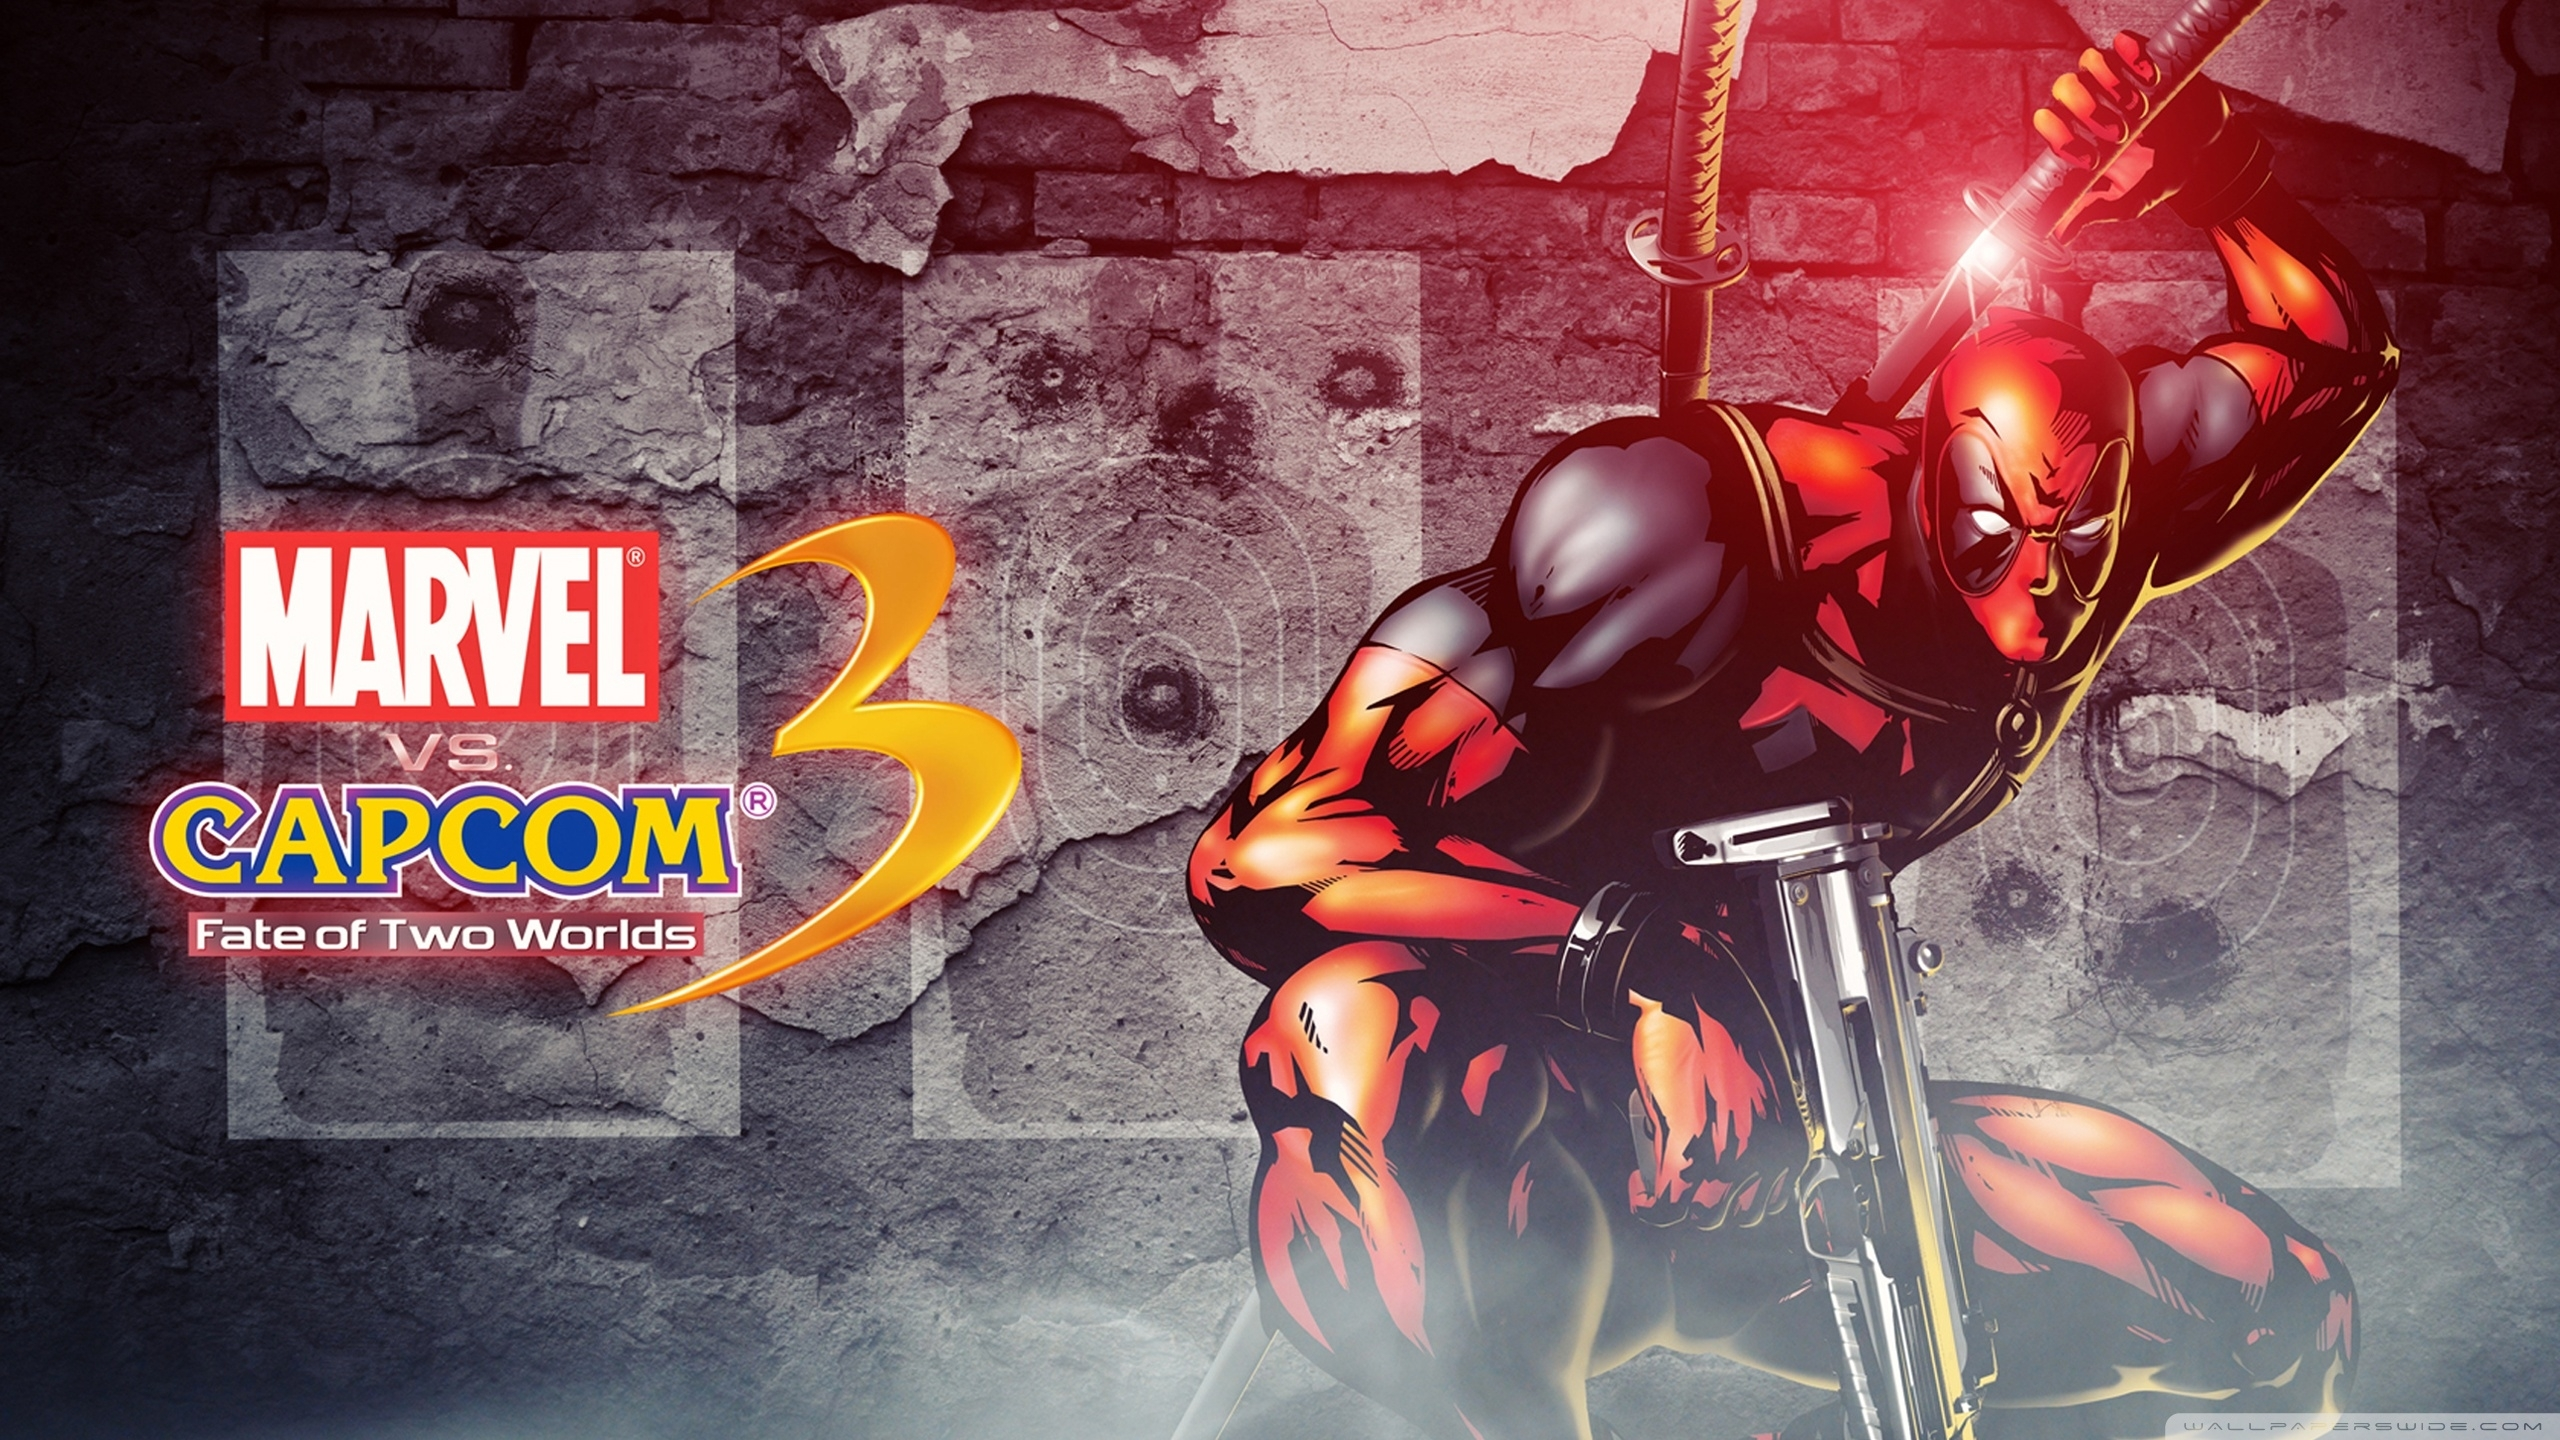 marvel vs capcom 3 - deadpool ❤ 4k hd desktop wallpaper for 4k